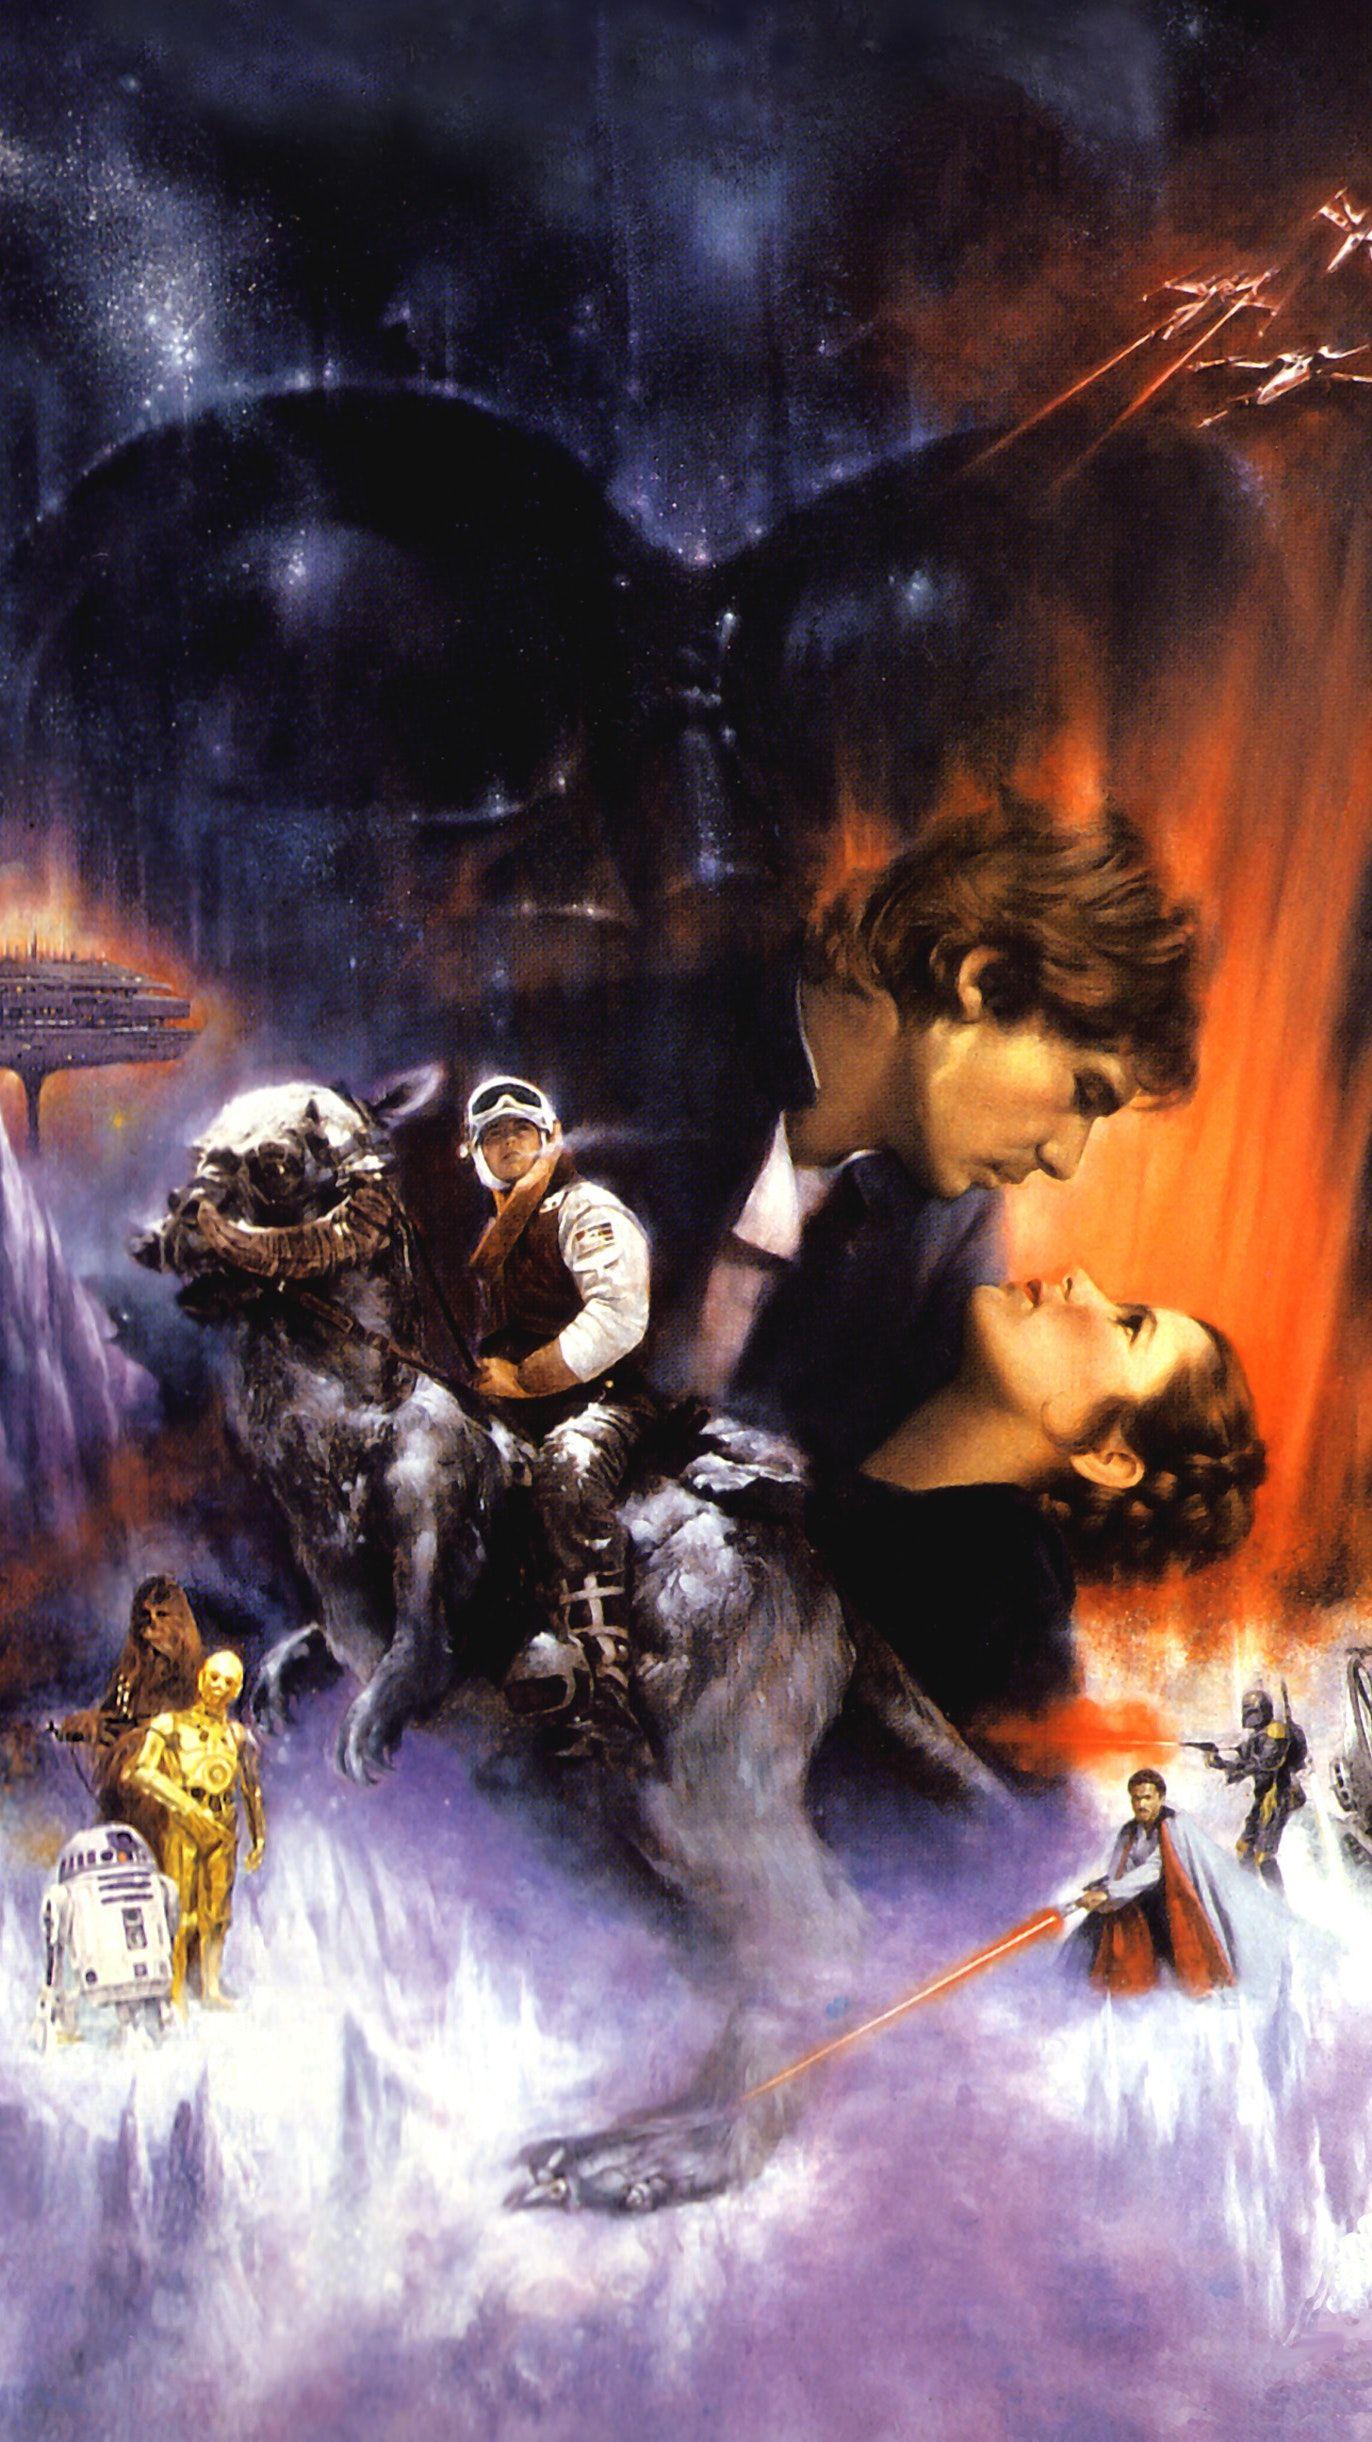 The Empire Strikes Back 1980 Phone Wallpaper Moviemania Star Wars Art Star Wars Background Star Wars Artwork